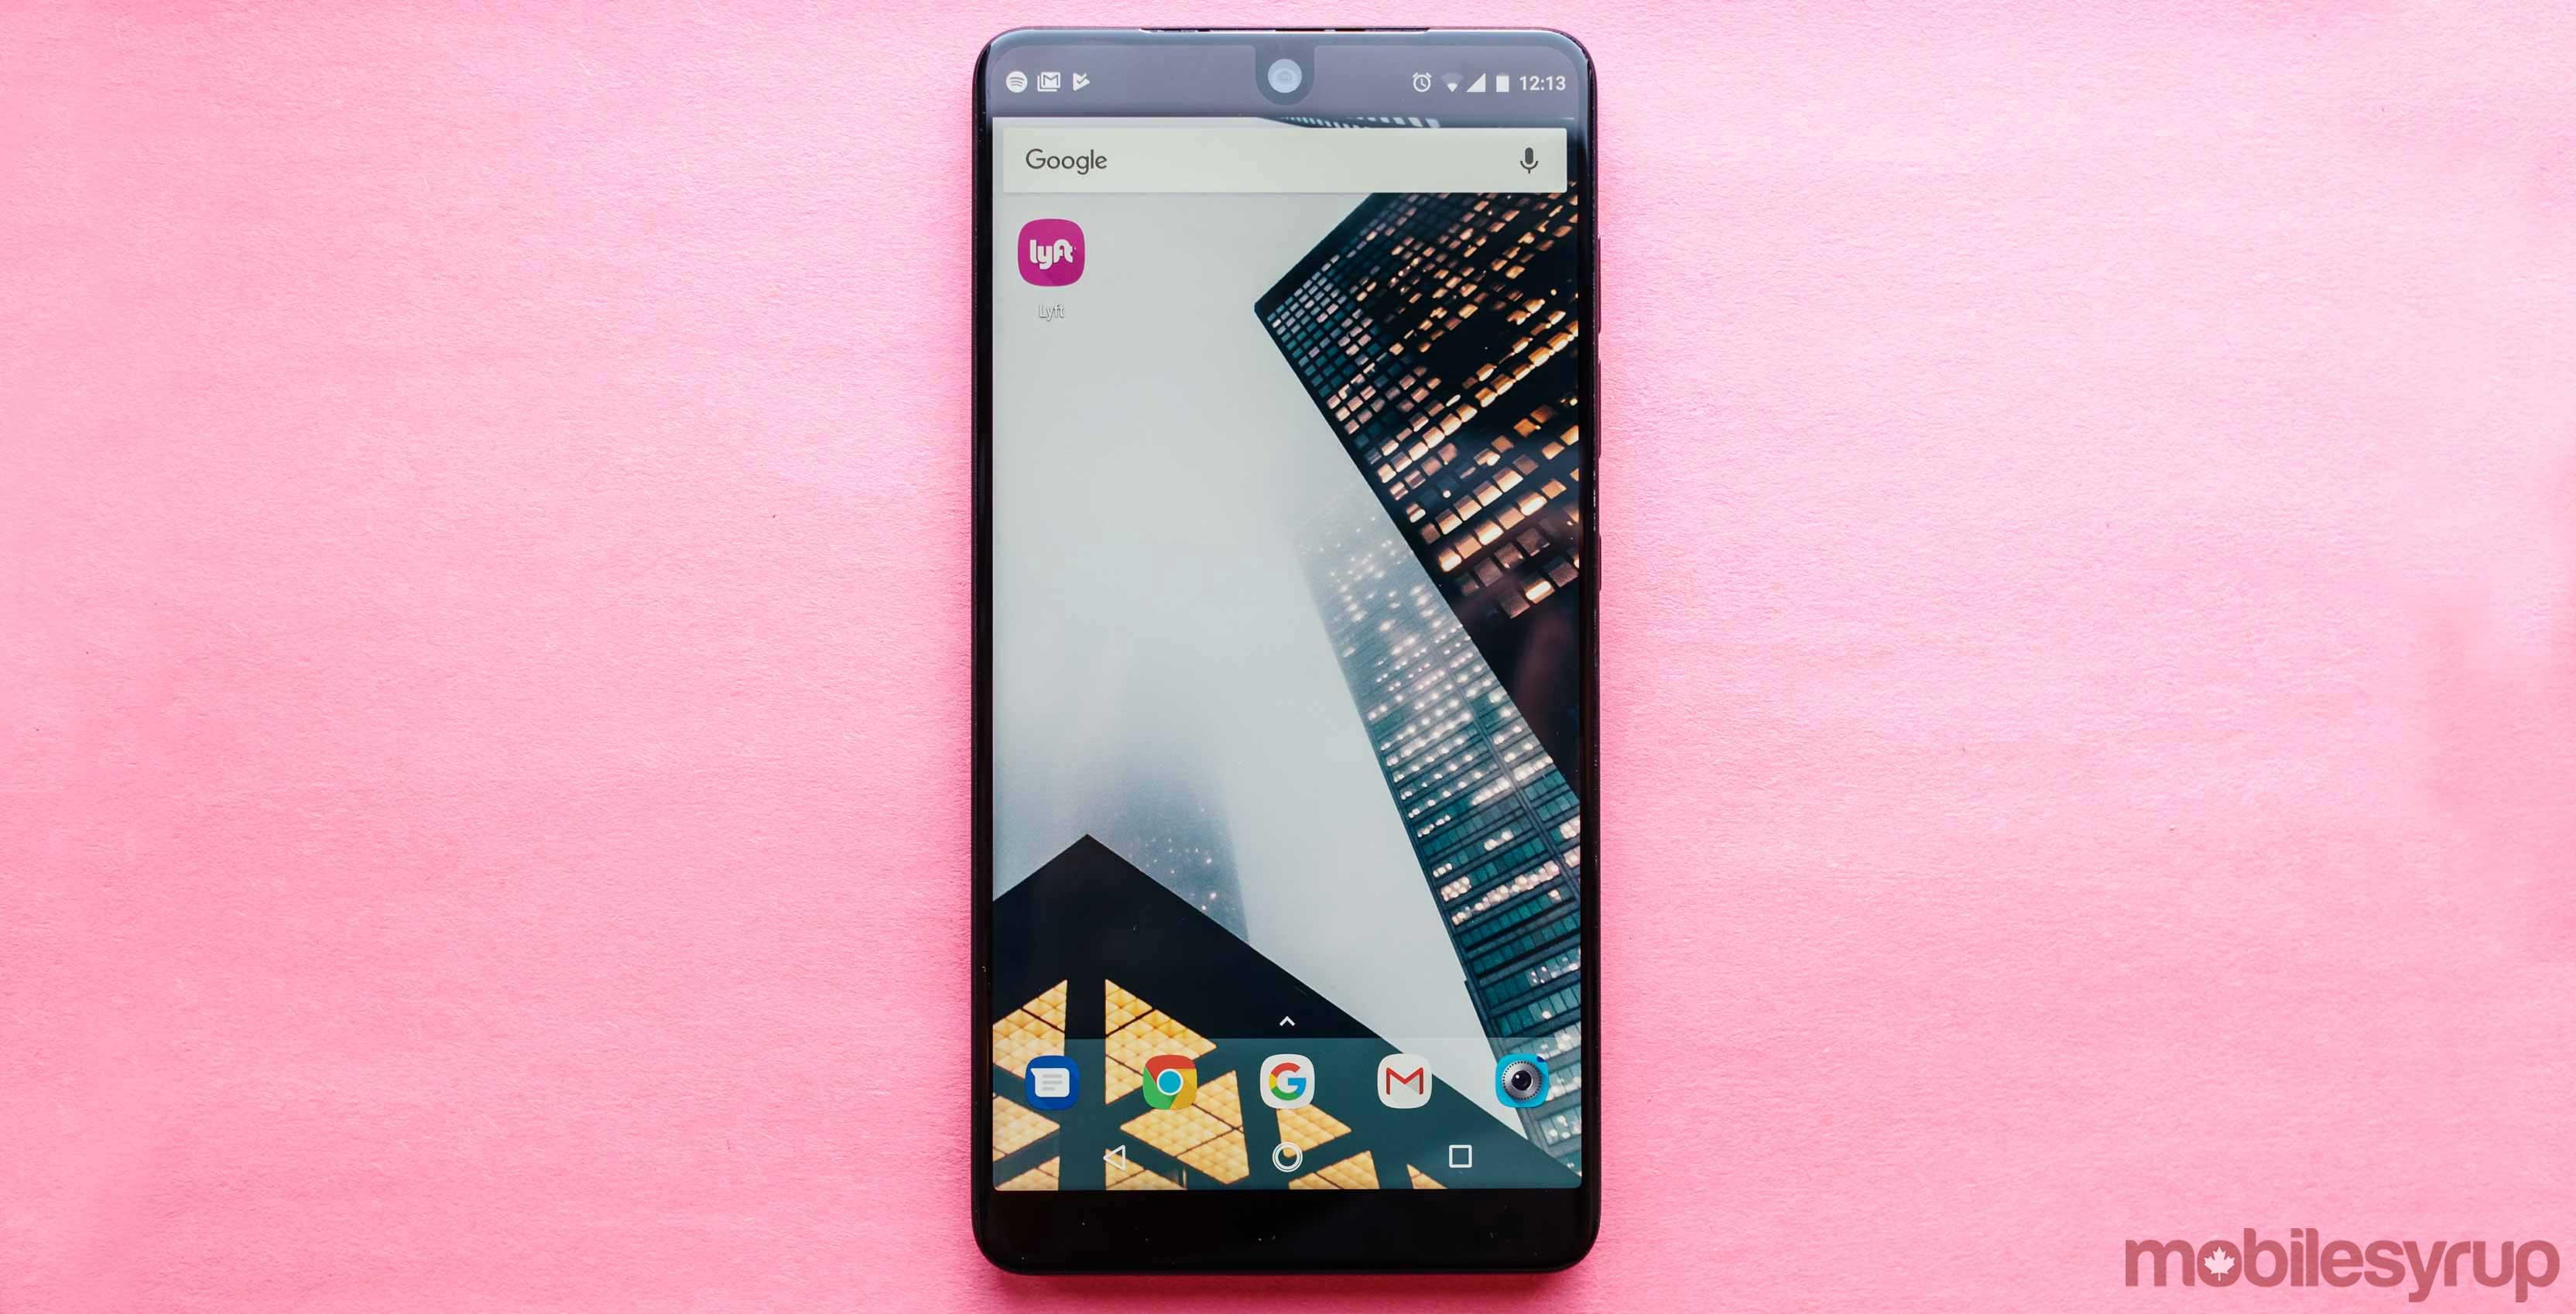 Lyft app on Android